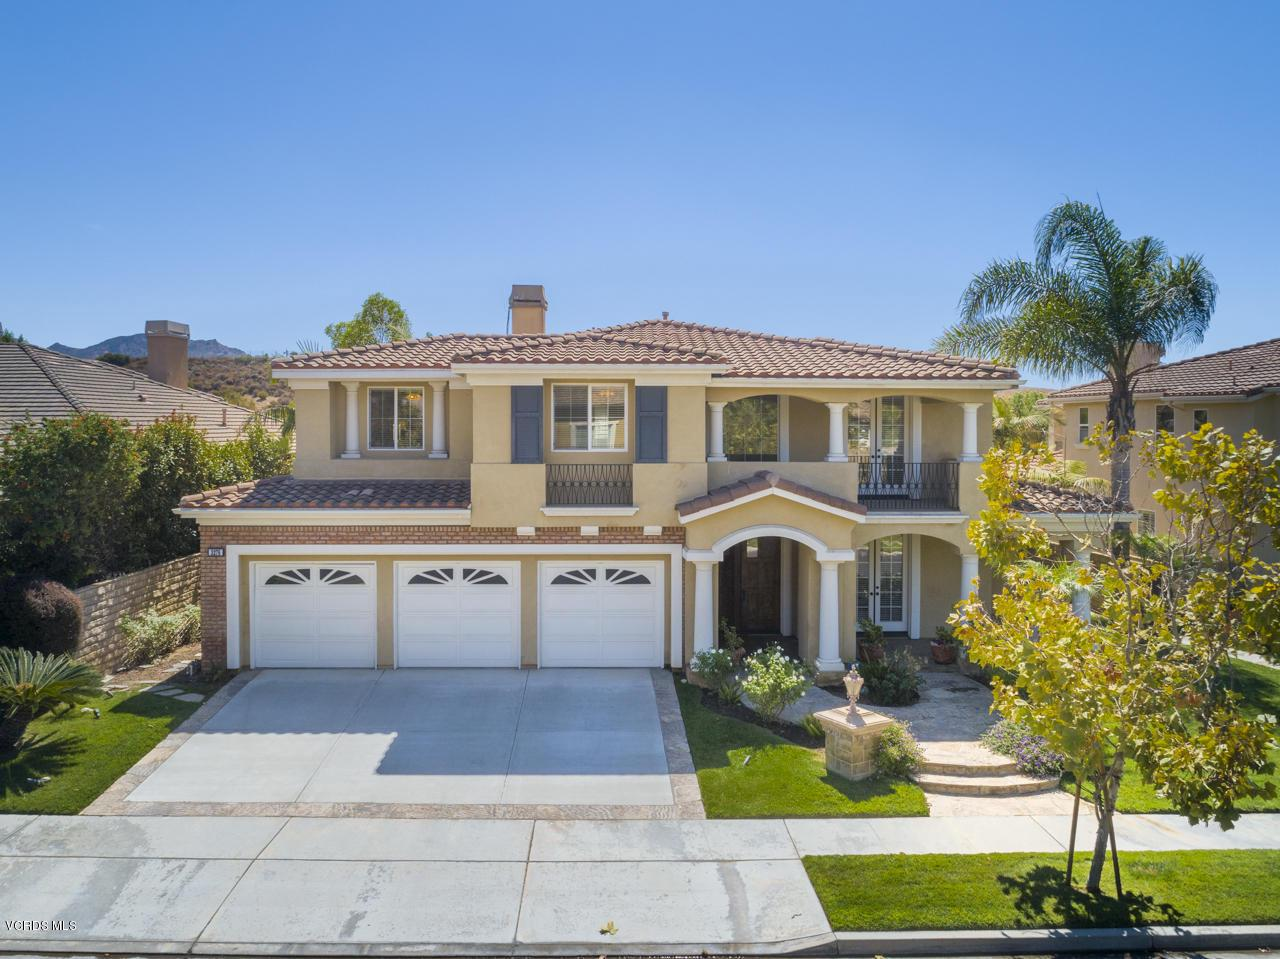 Photo of 3276 WILLOW CANYON Street, Thousand Oaks, CA 91362